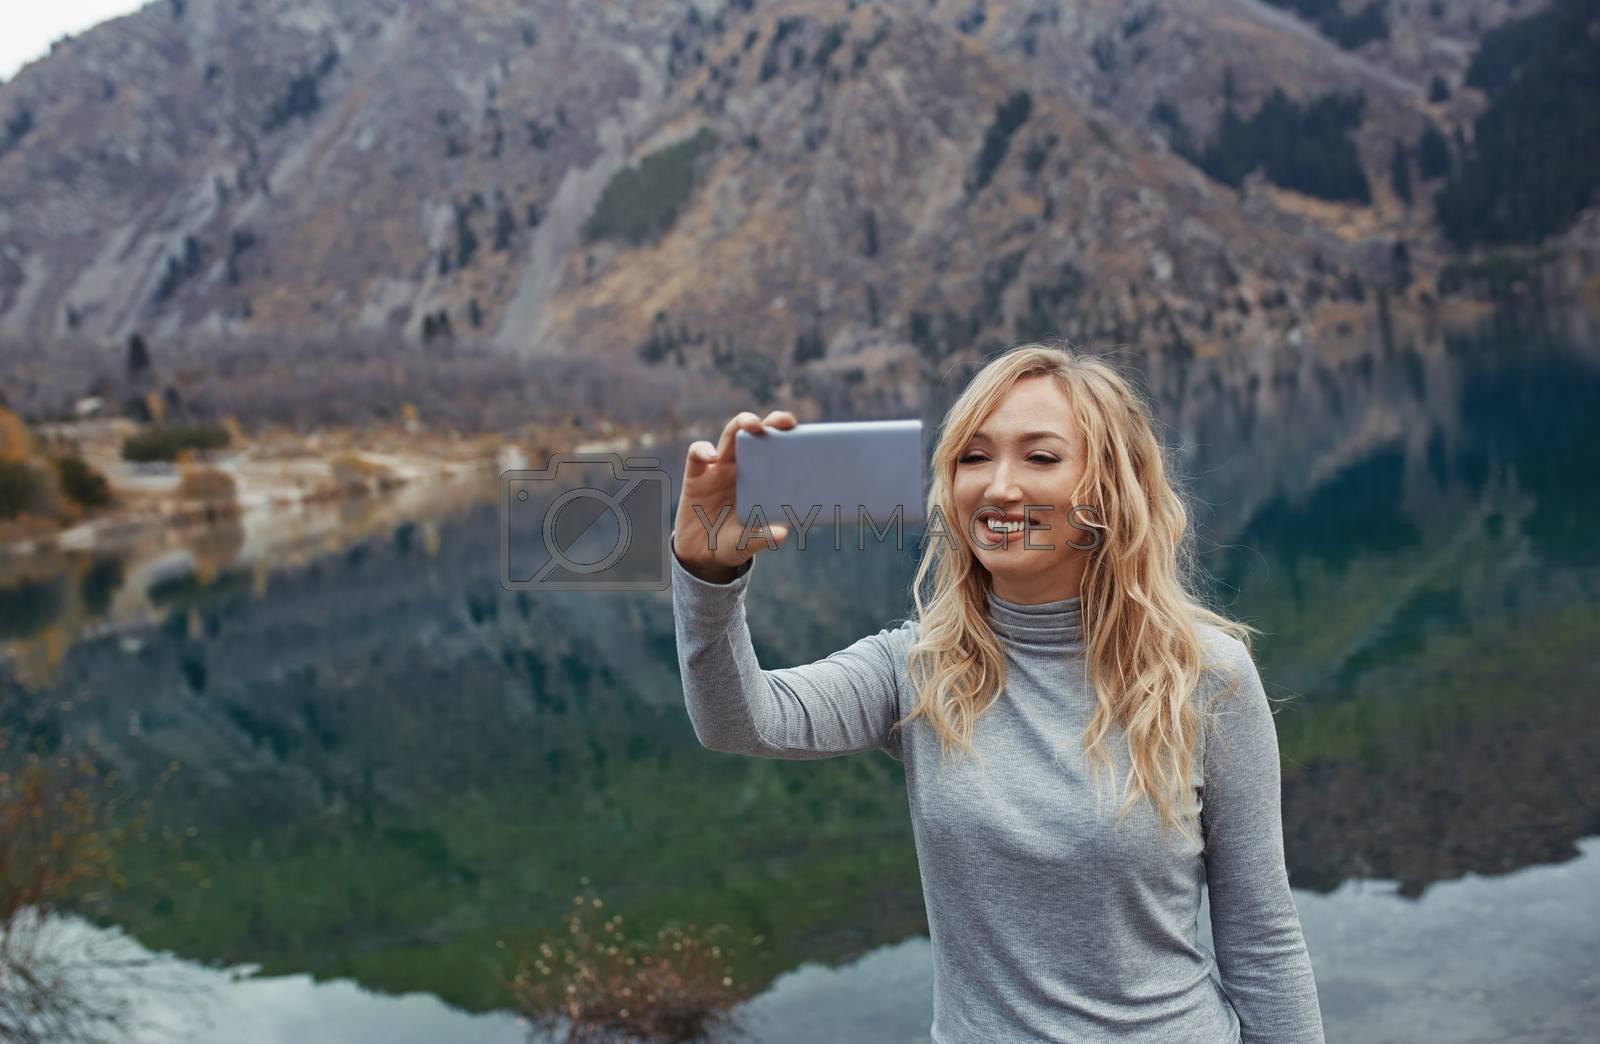 Smiling woman makes selfie at the mountain lake